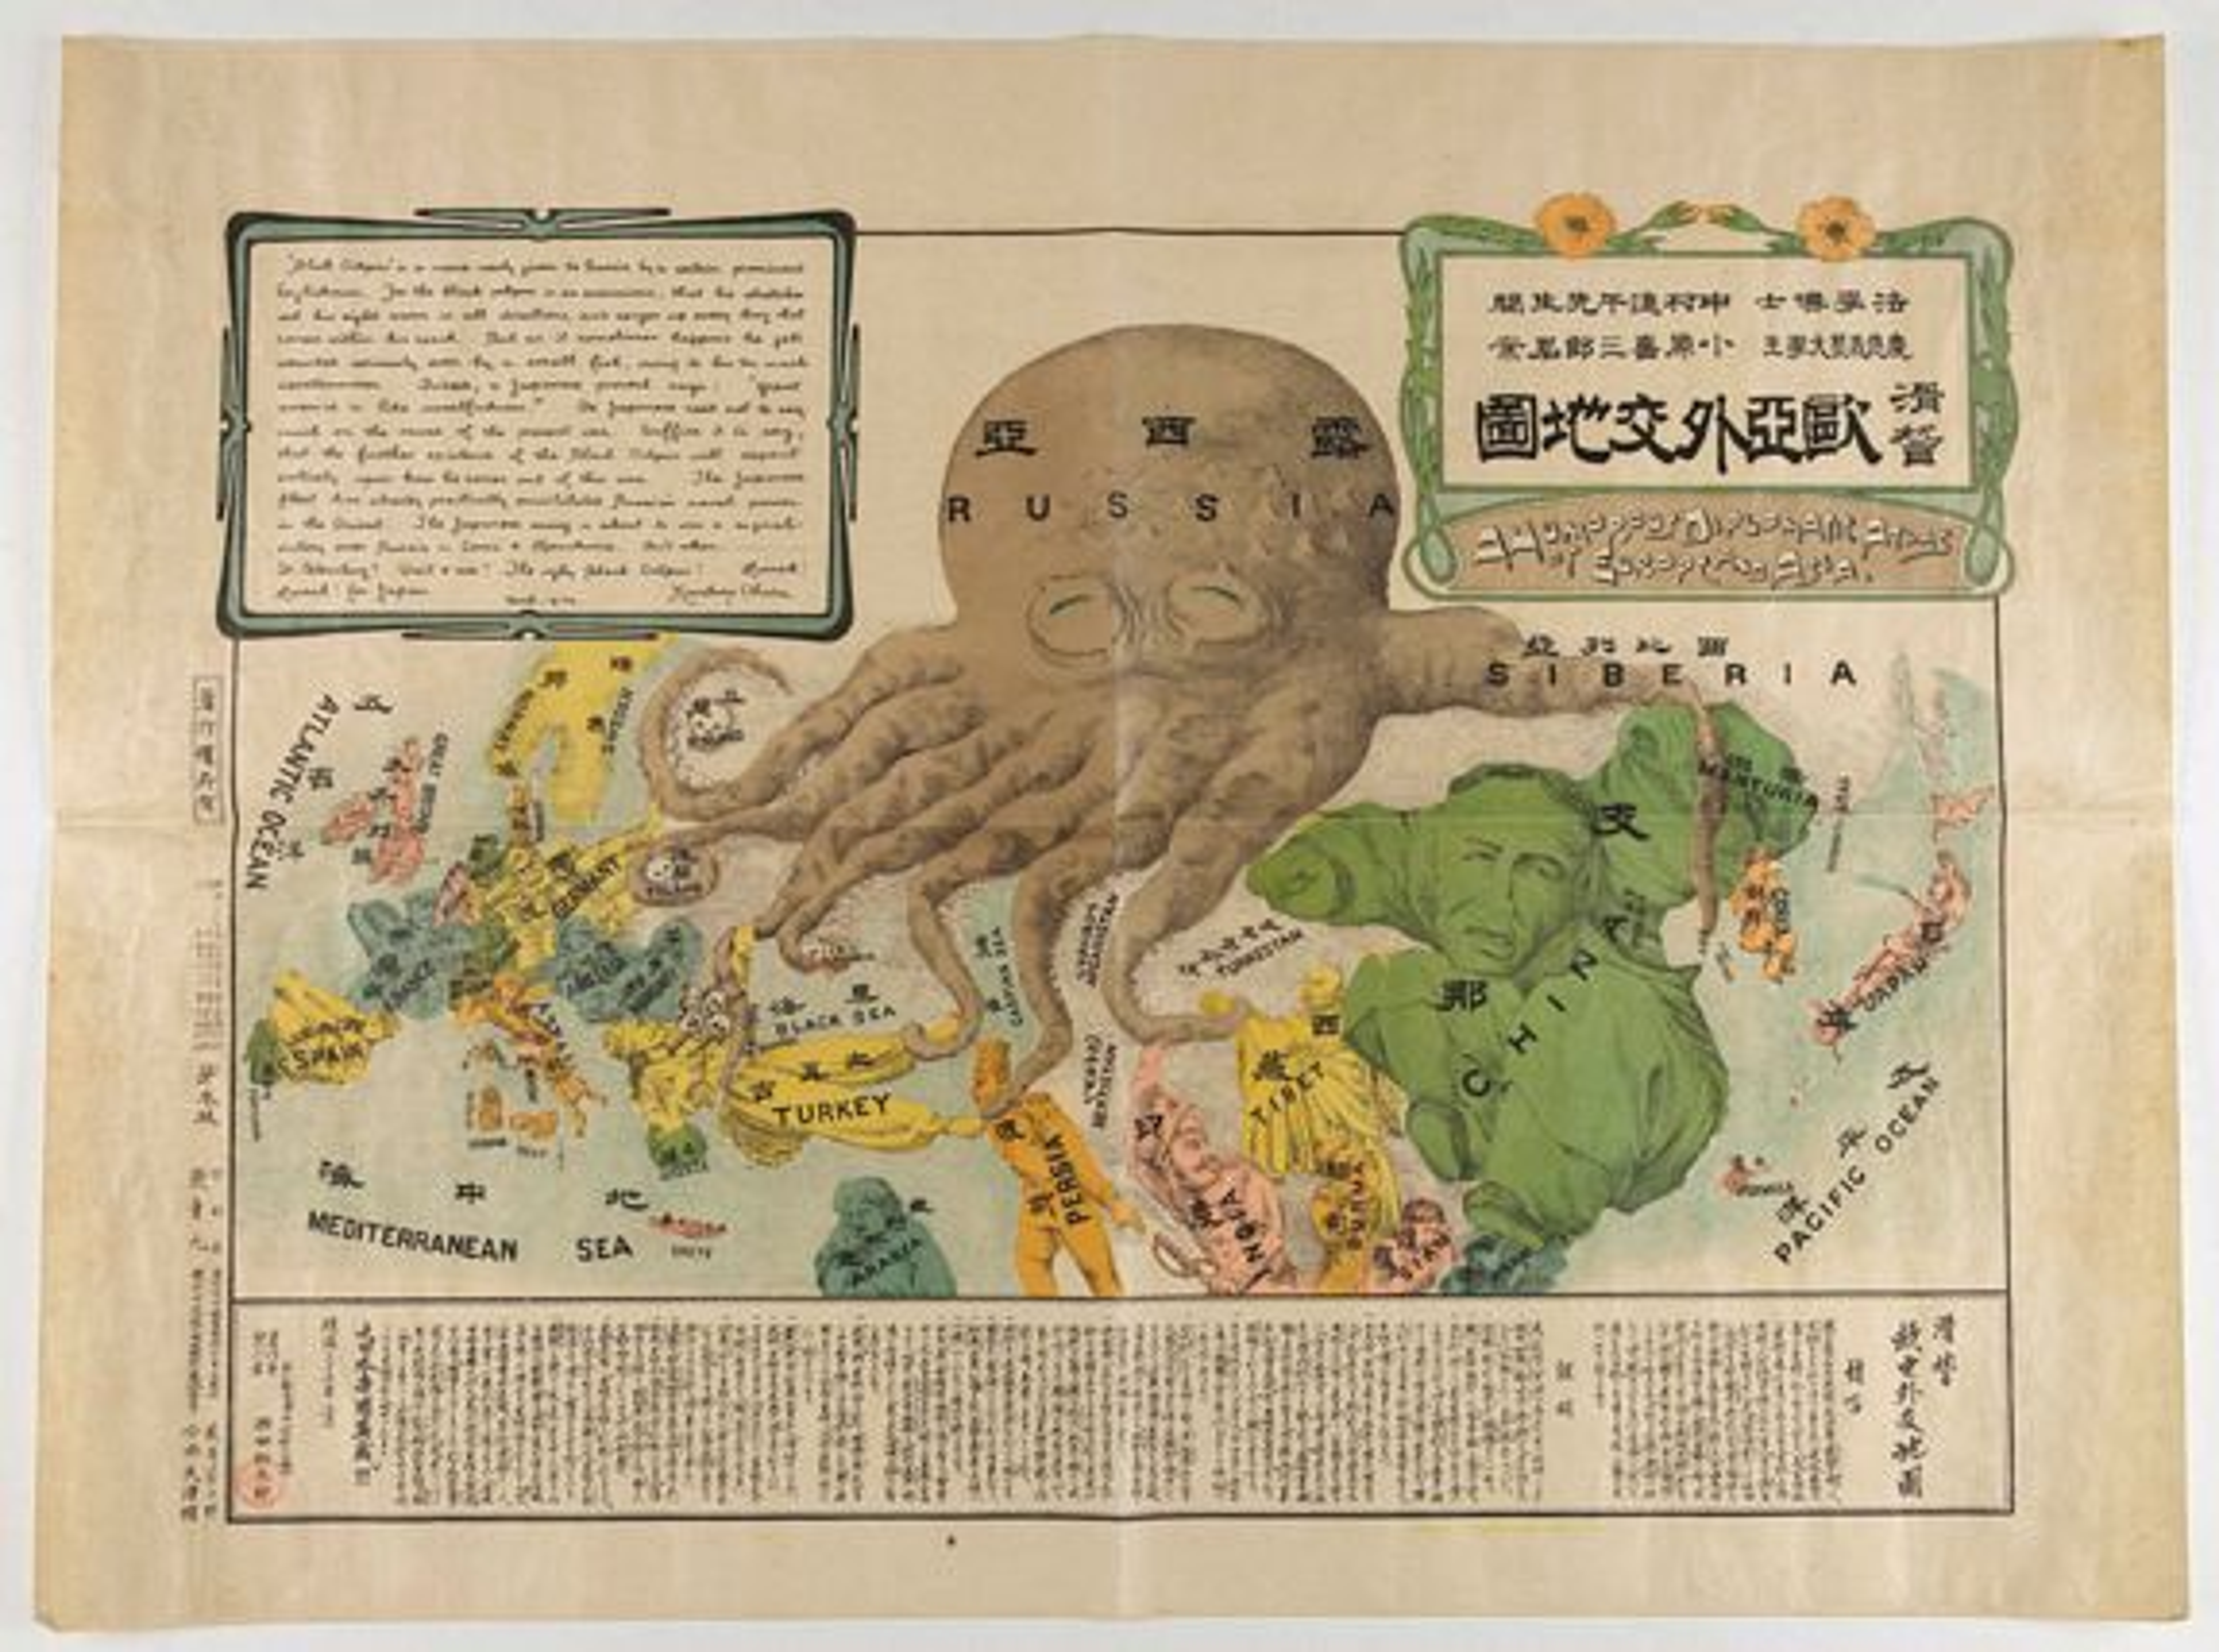 OHARA, K. -  A Humorous Diplomatic Atlas of Europe and Asia. / 滑稽欧亜外交地図 / Kokkei Ō-A Gaikō Chizu.